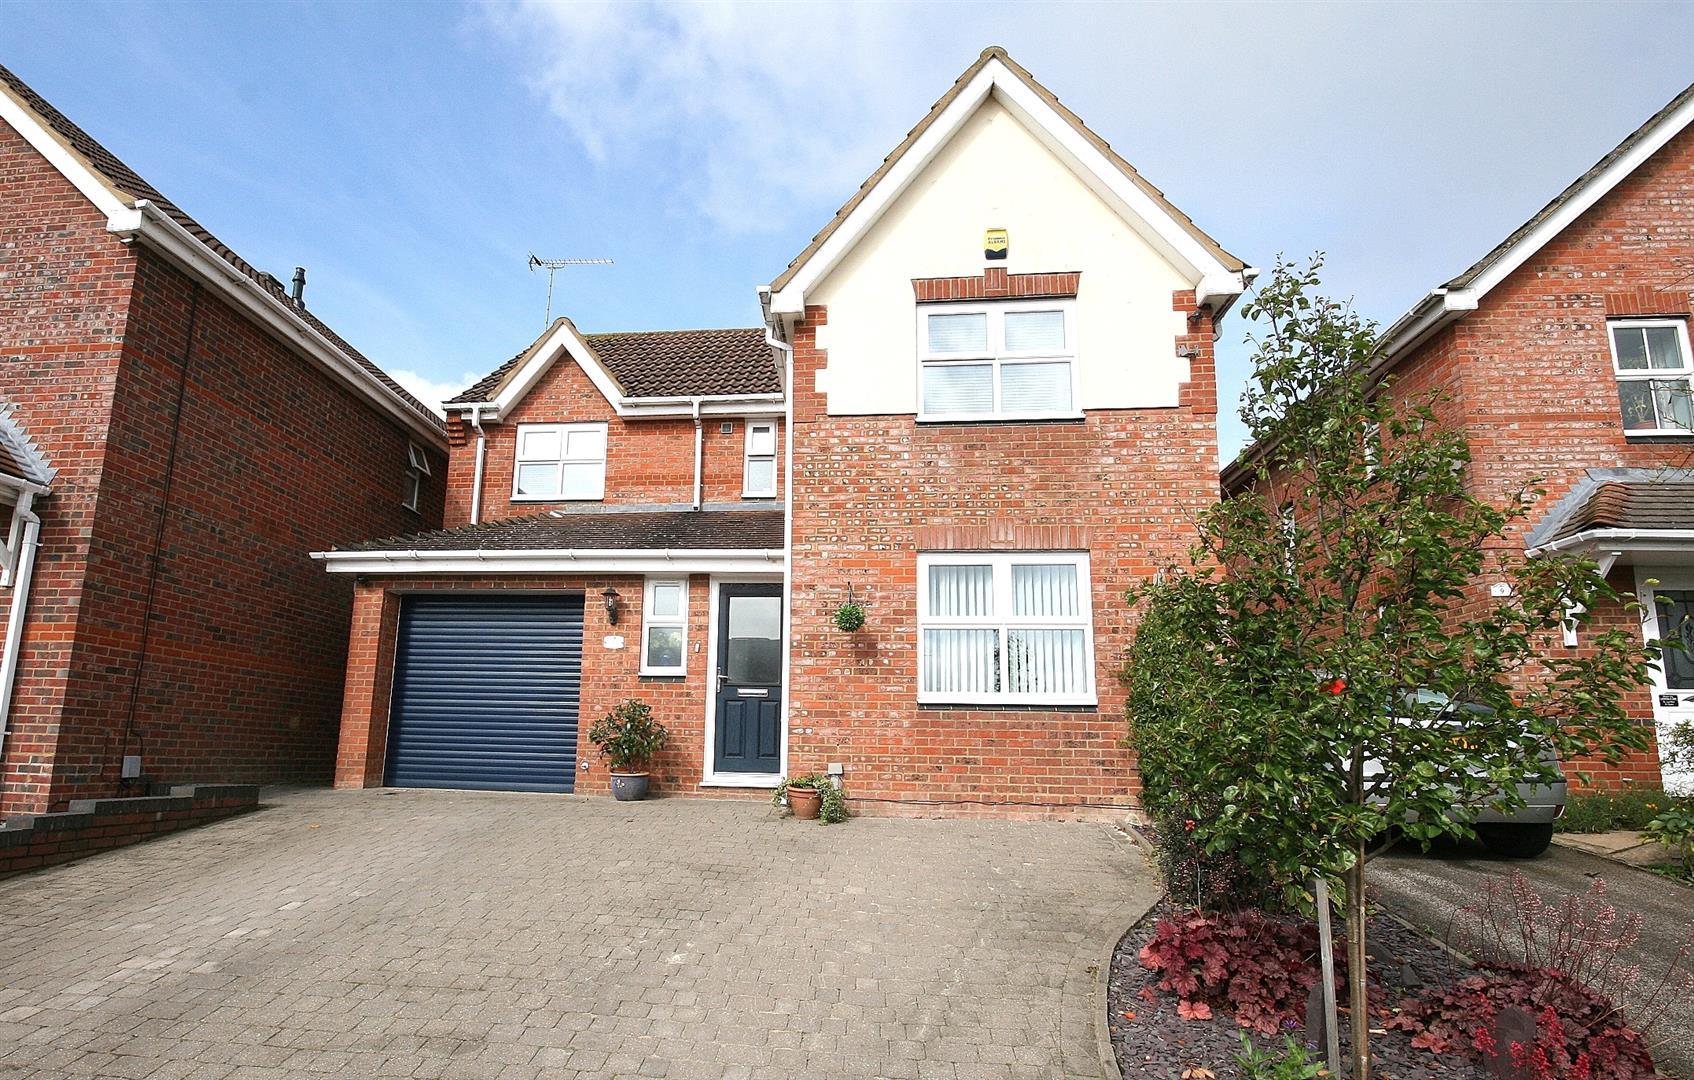 5 Bedrooms Detached House for sale in Arnald Way, Houghton Regis, Dunstable, Beds